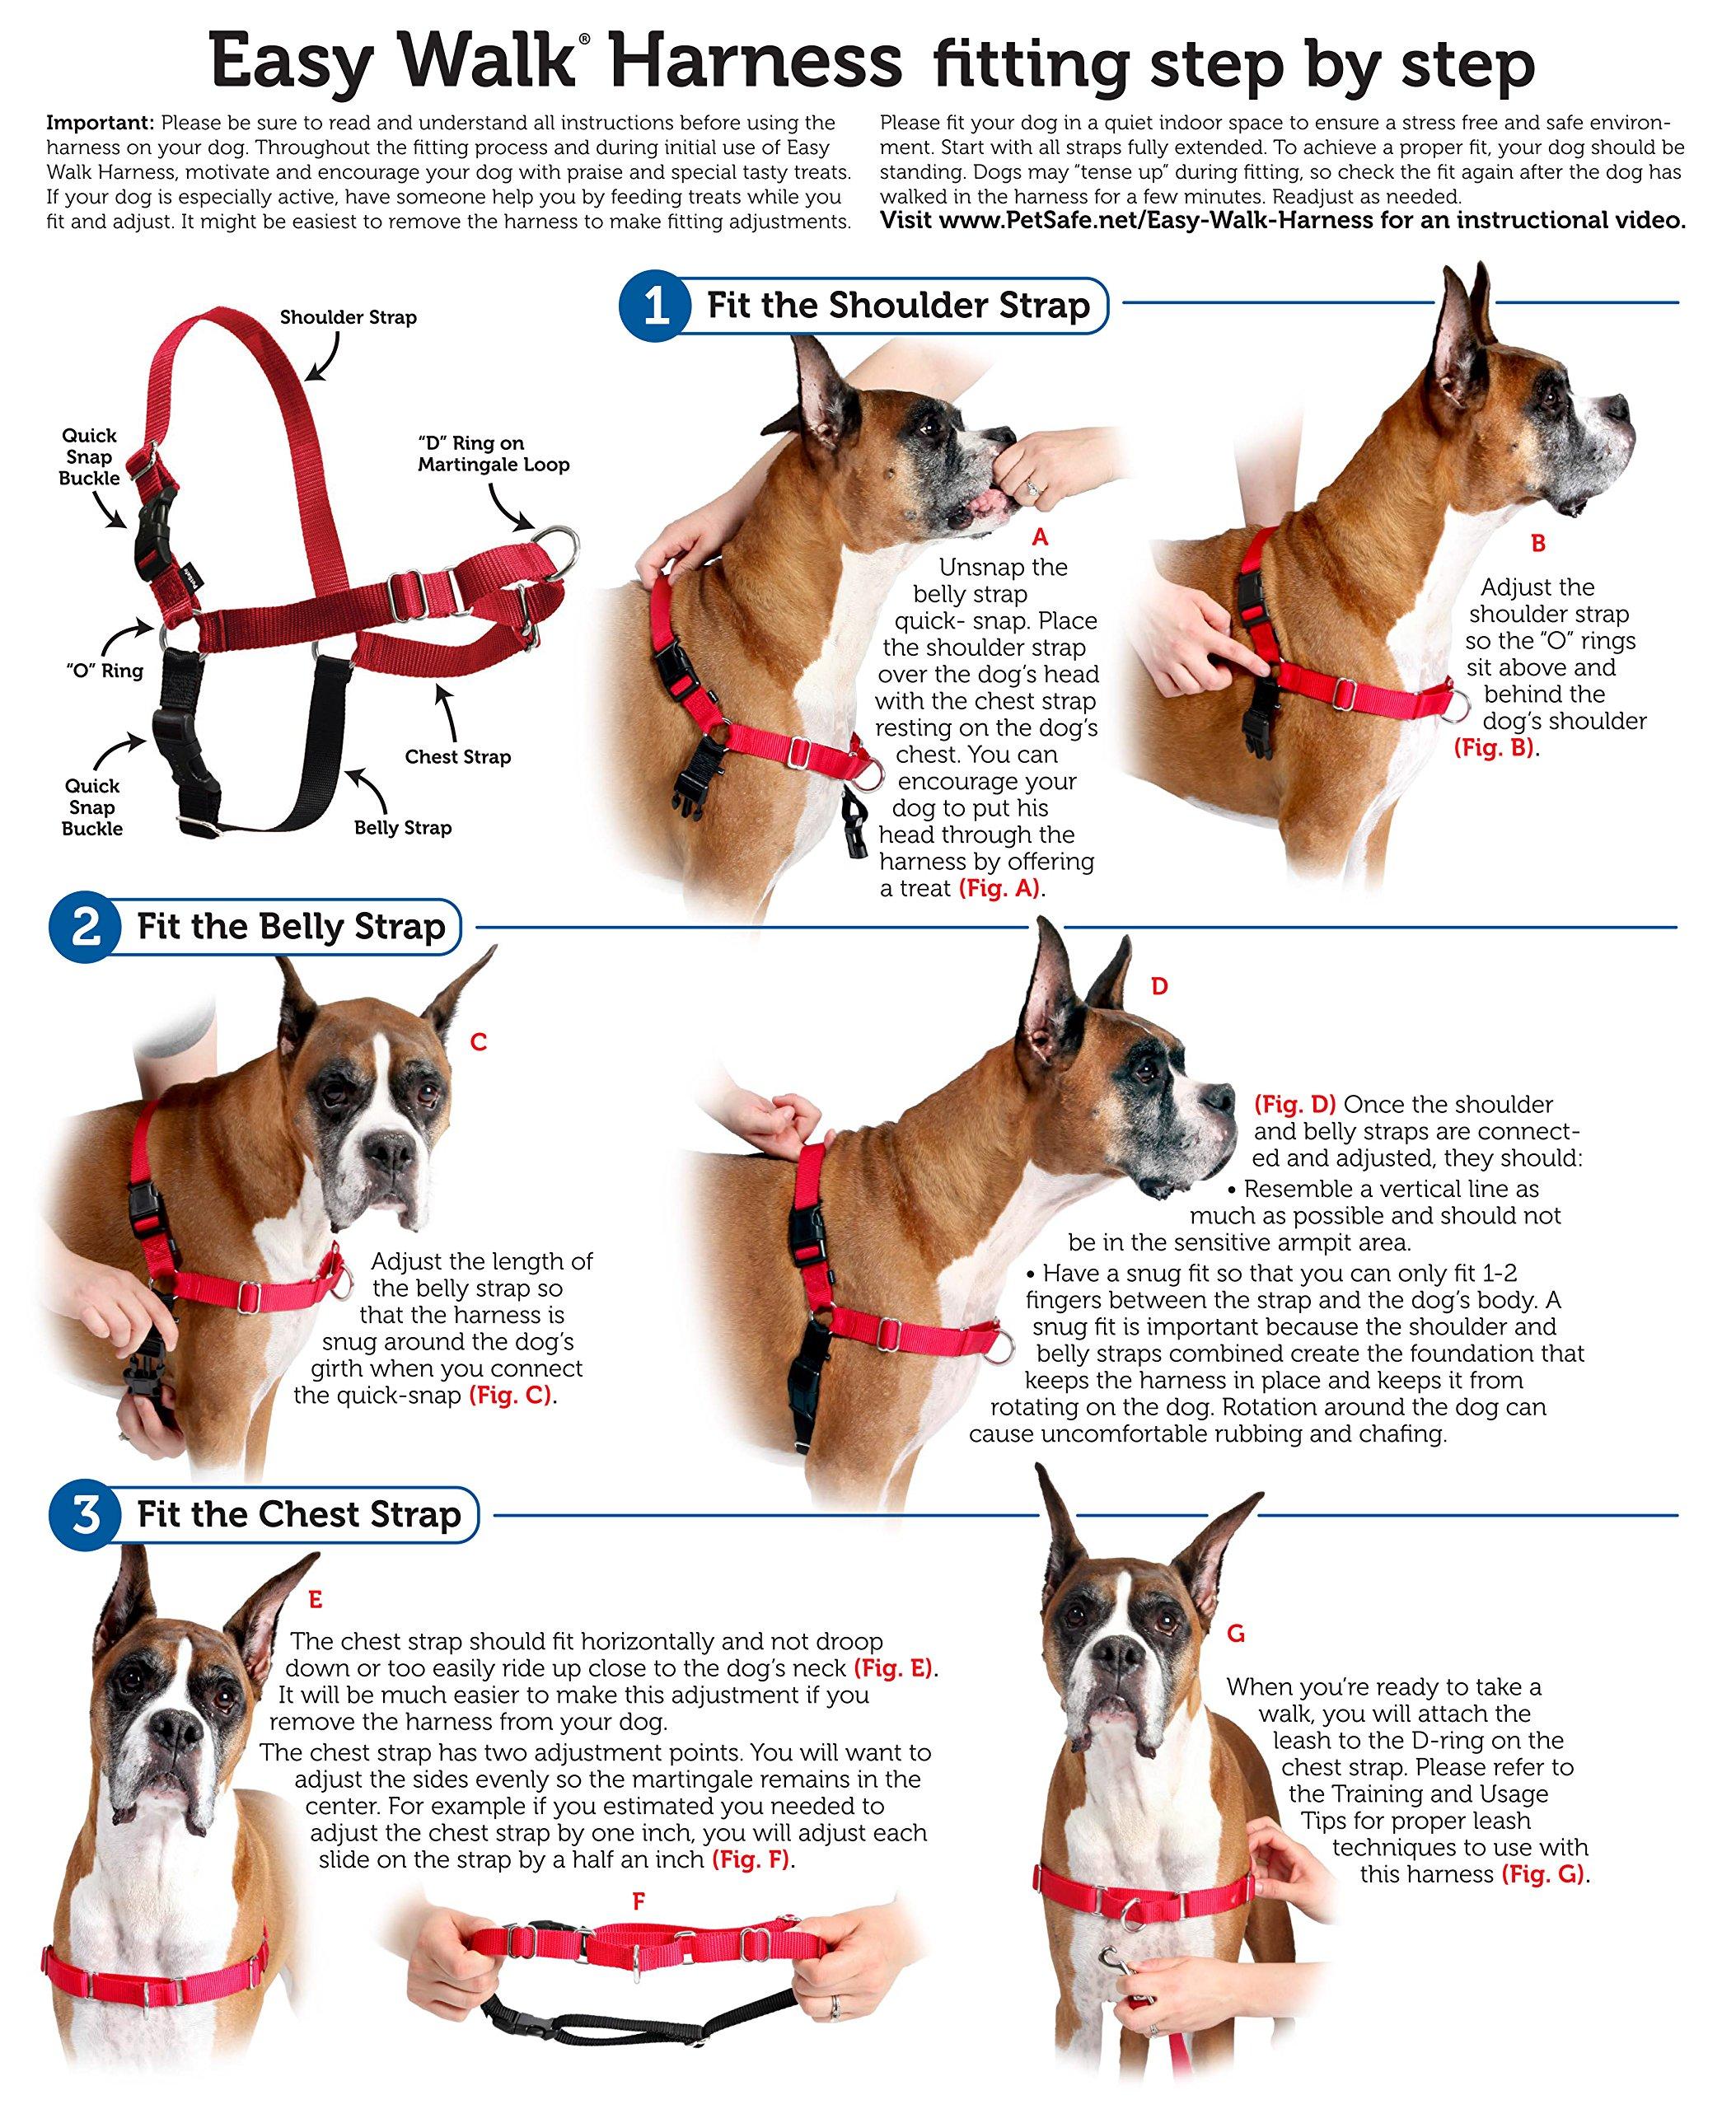 PetSafe Easy Walk Harness, Medium/Large, BLACK/SILVER for Dogs by PetSafe (Image #5)